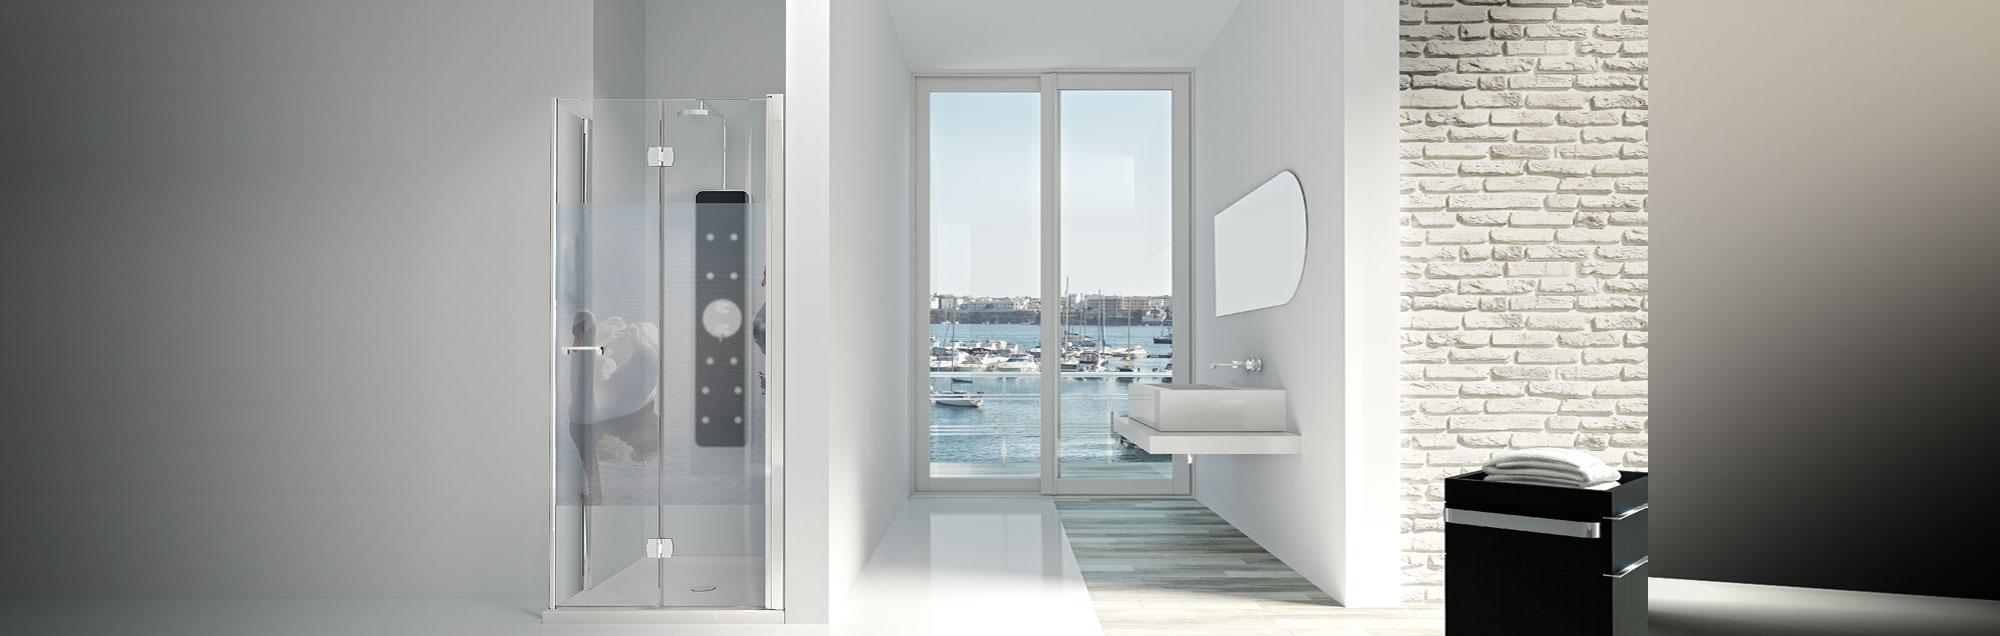 Serie Arcoíris Plus de mamparas plegables de baño a medida